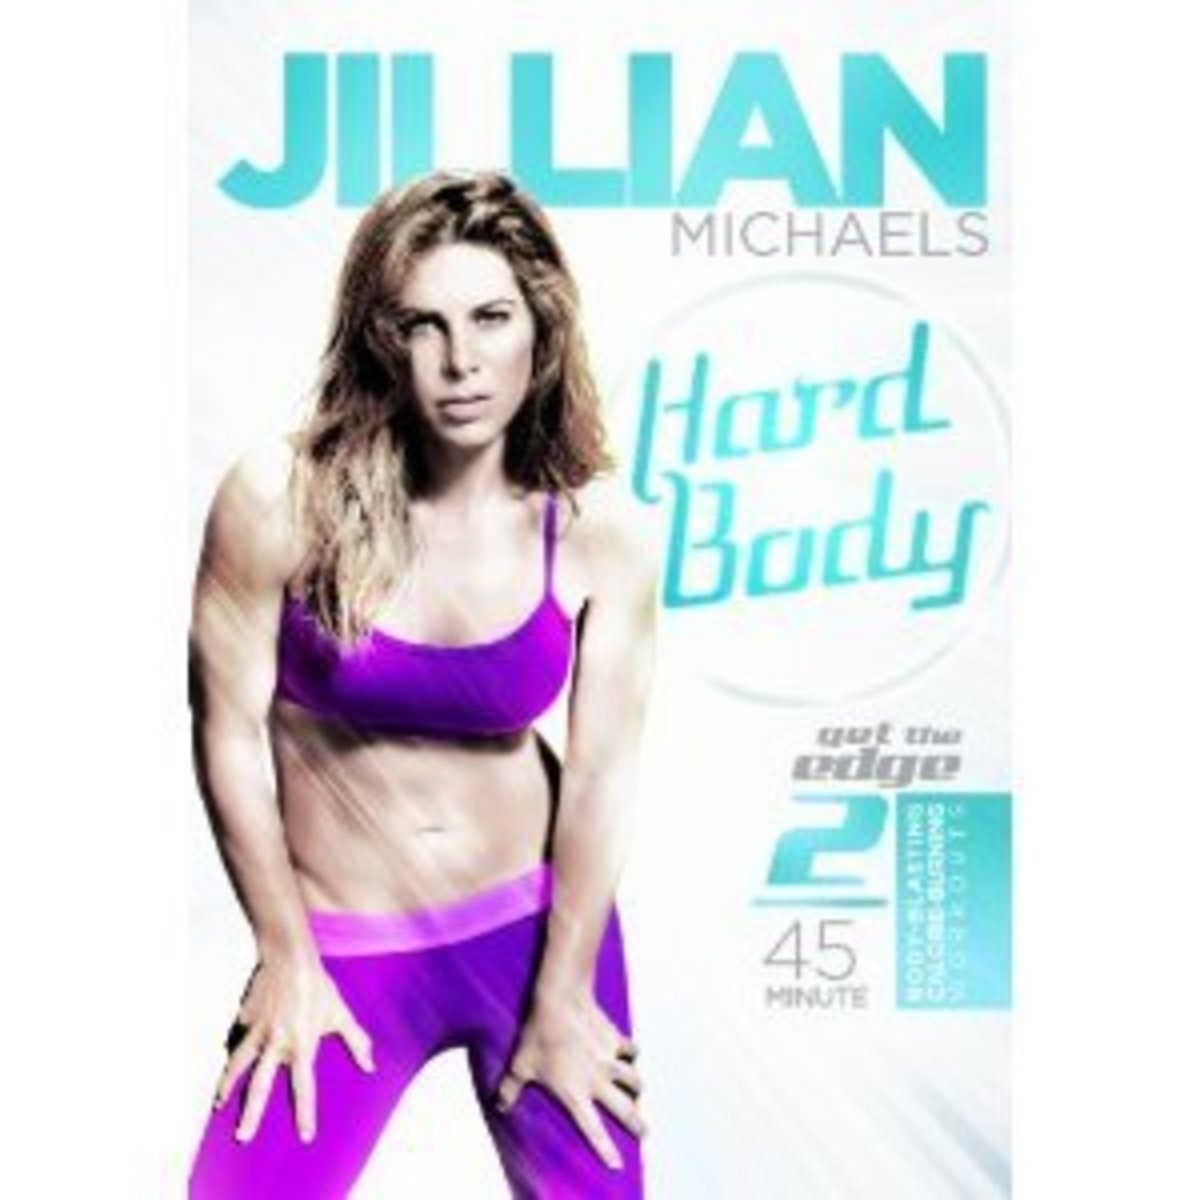 Review Of Jillian Michaels Hard Body Dvd